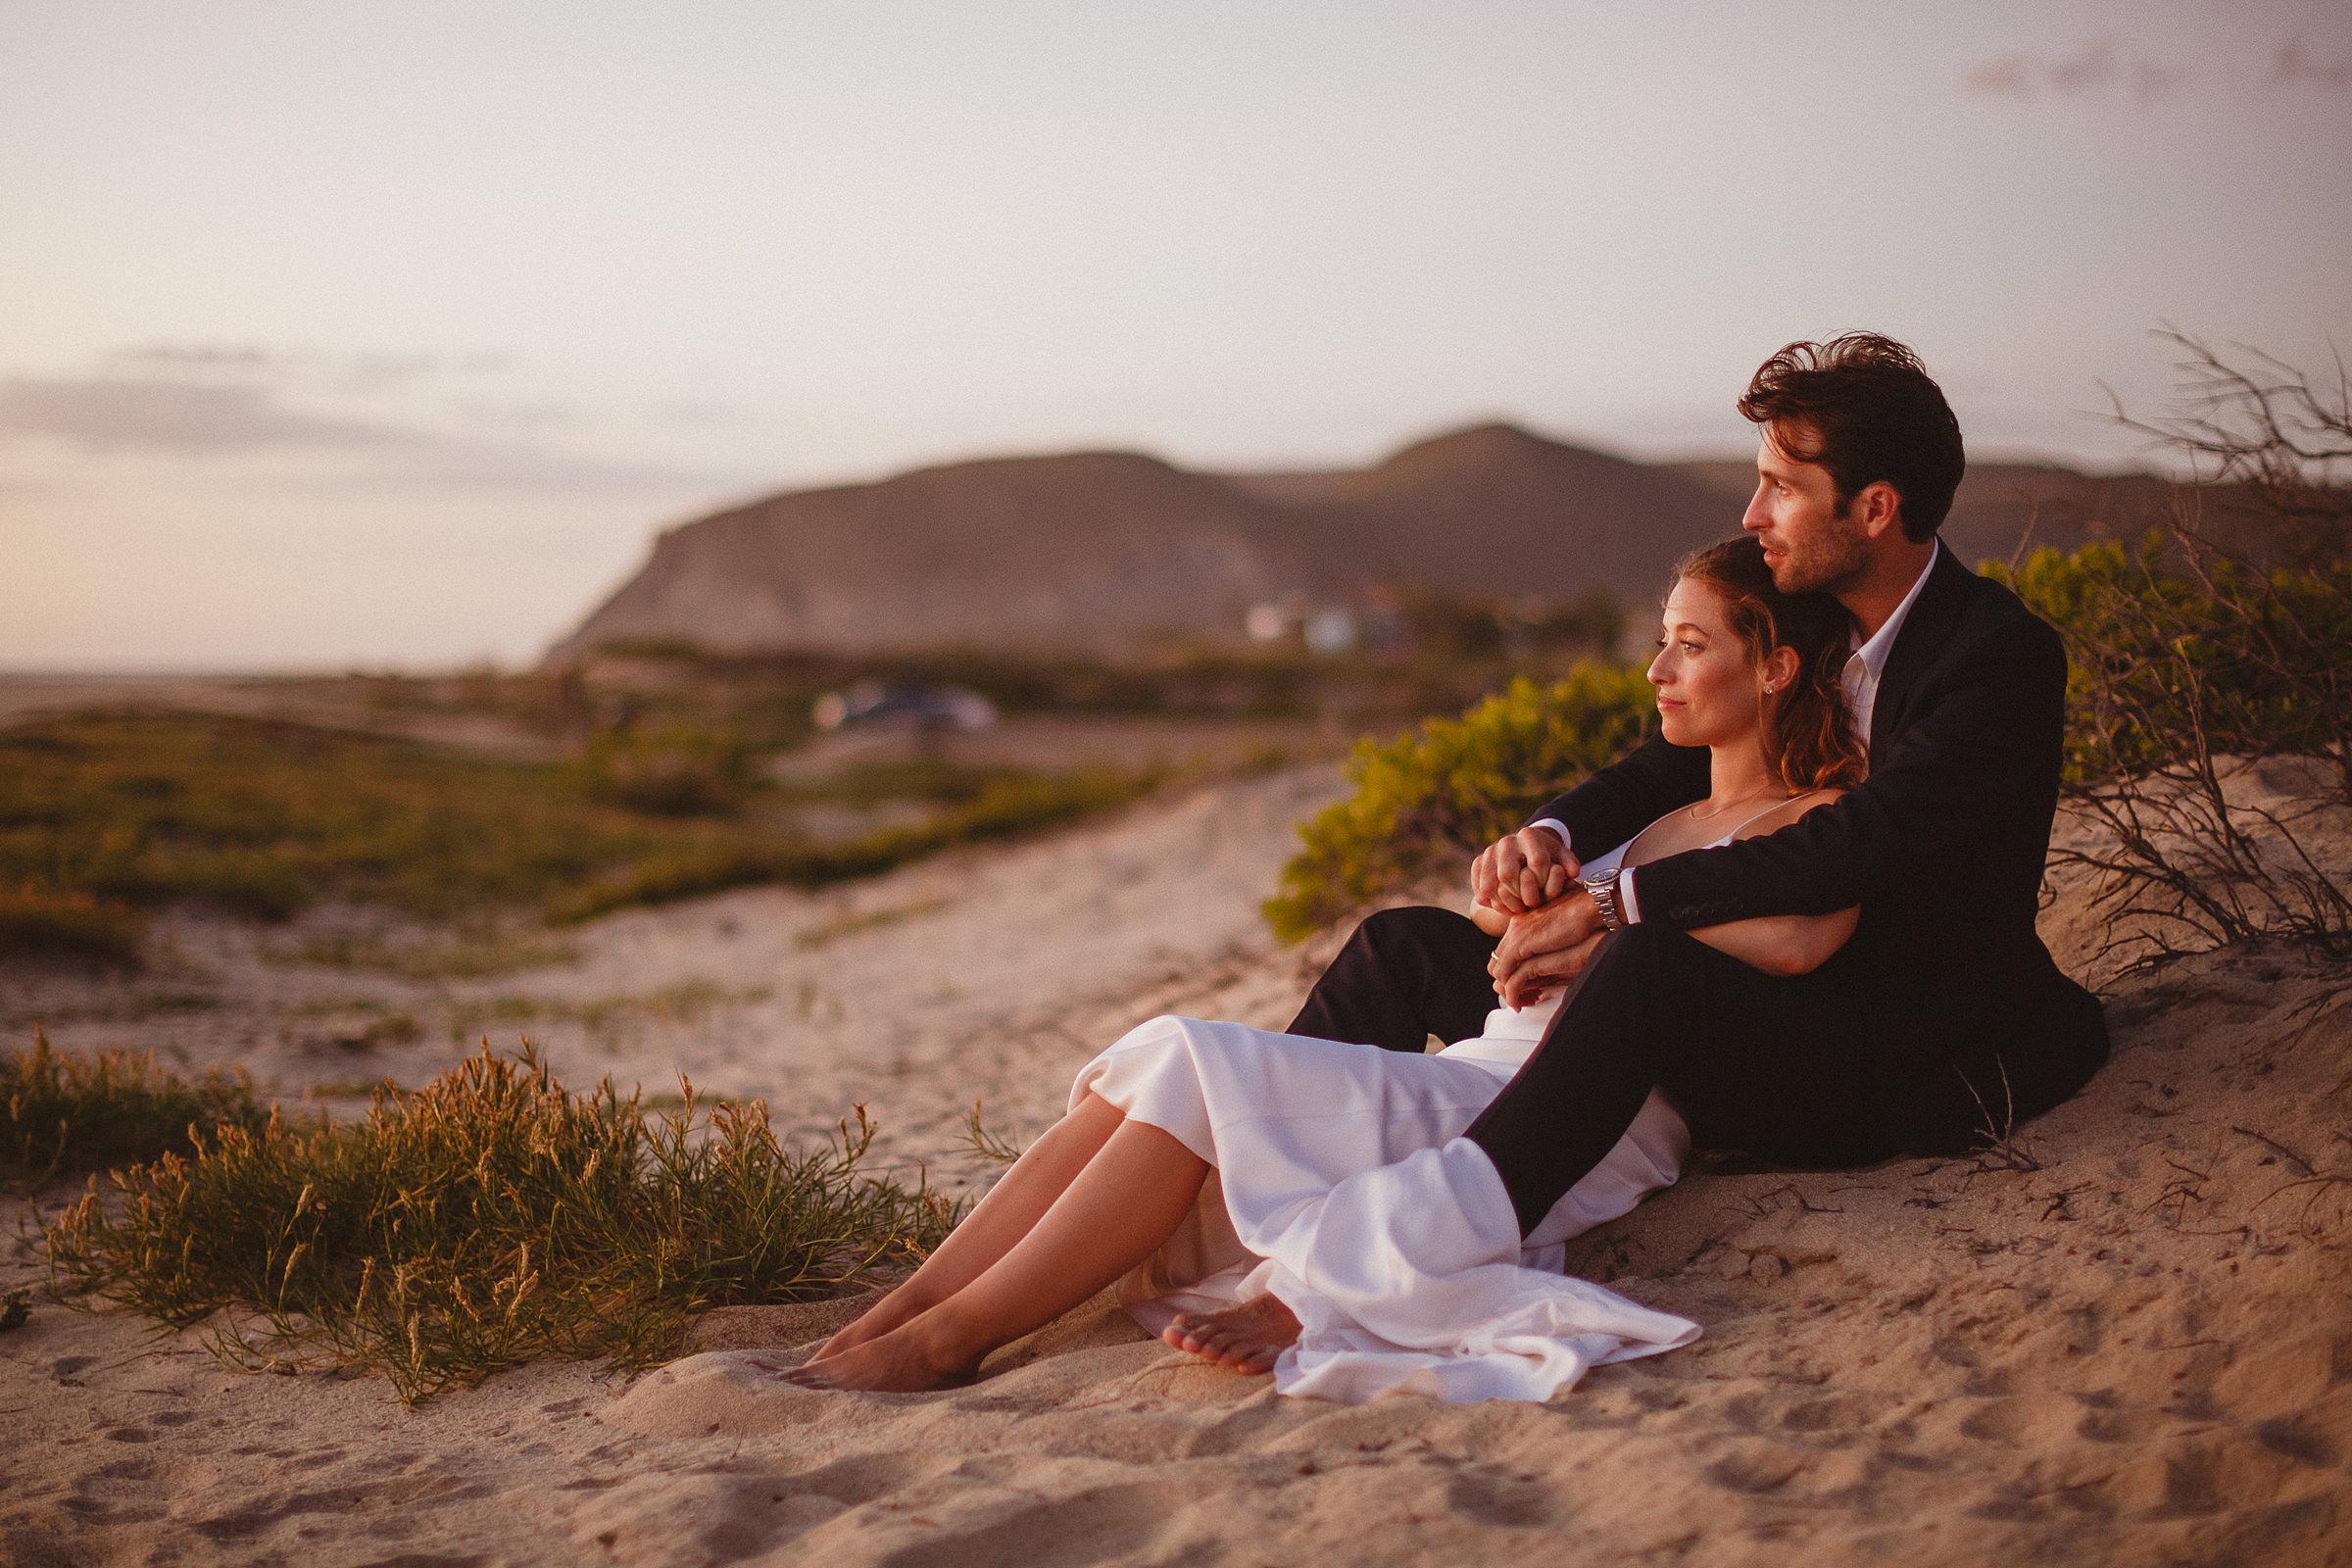 barefoot-couple-portrait-on-sand-dunes-ed-peers-photography